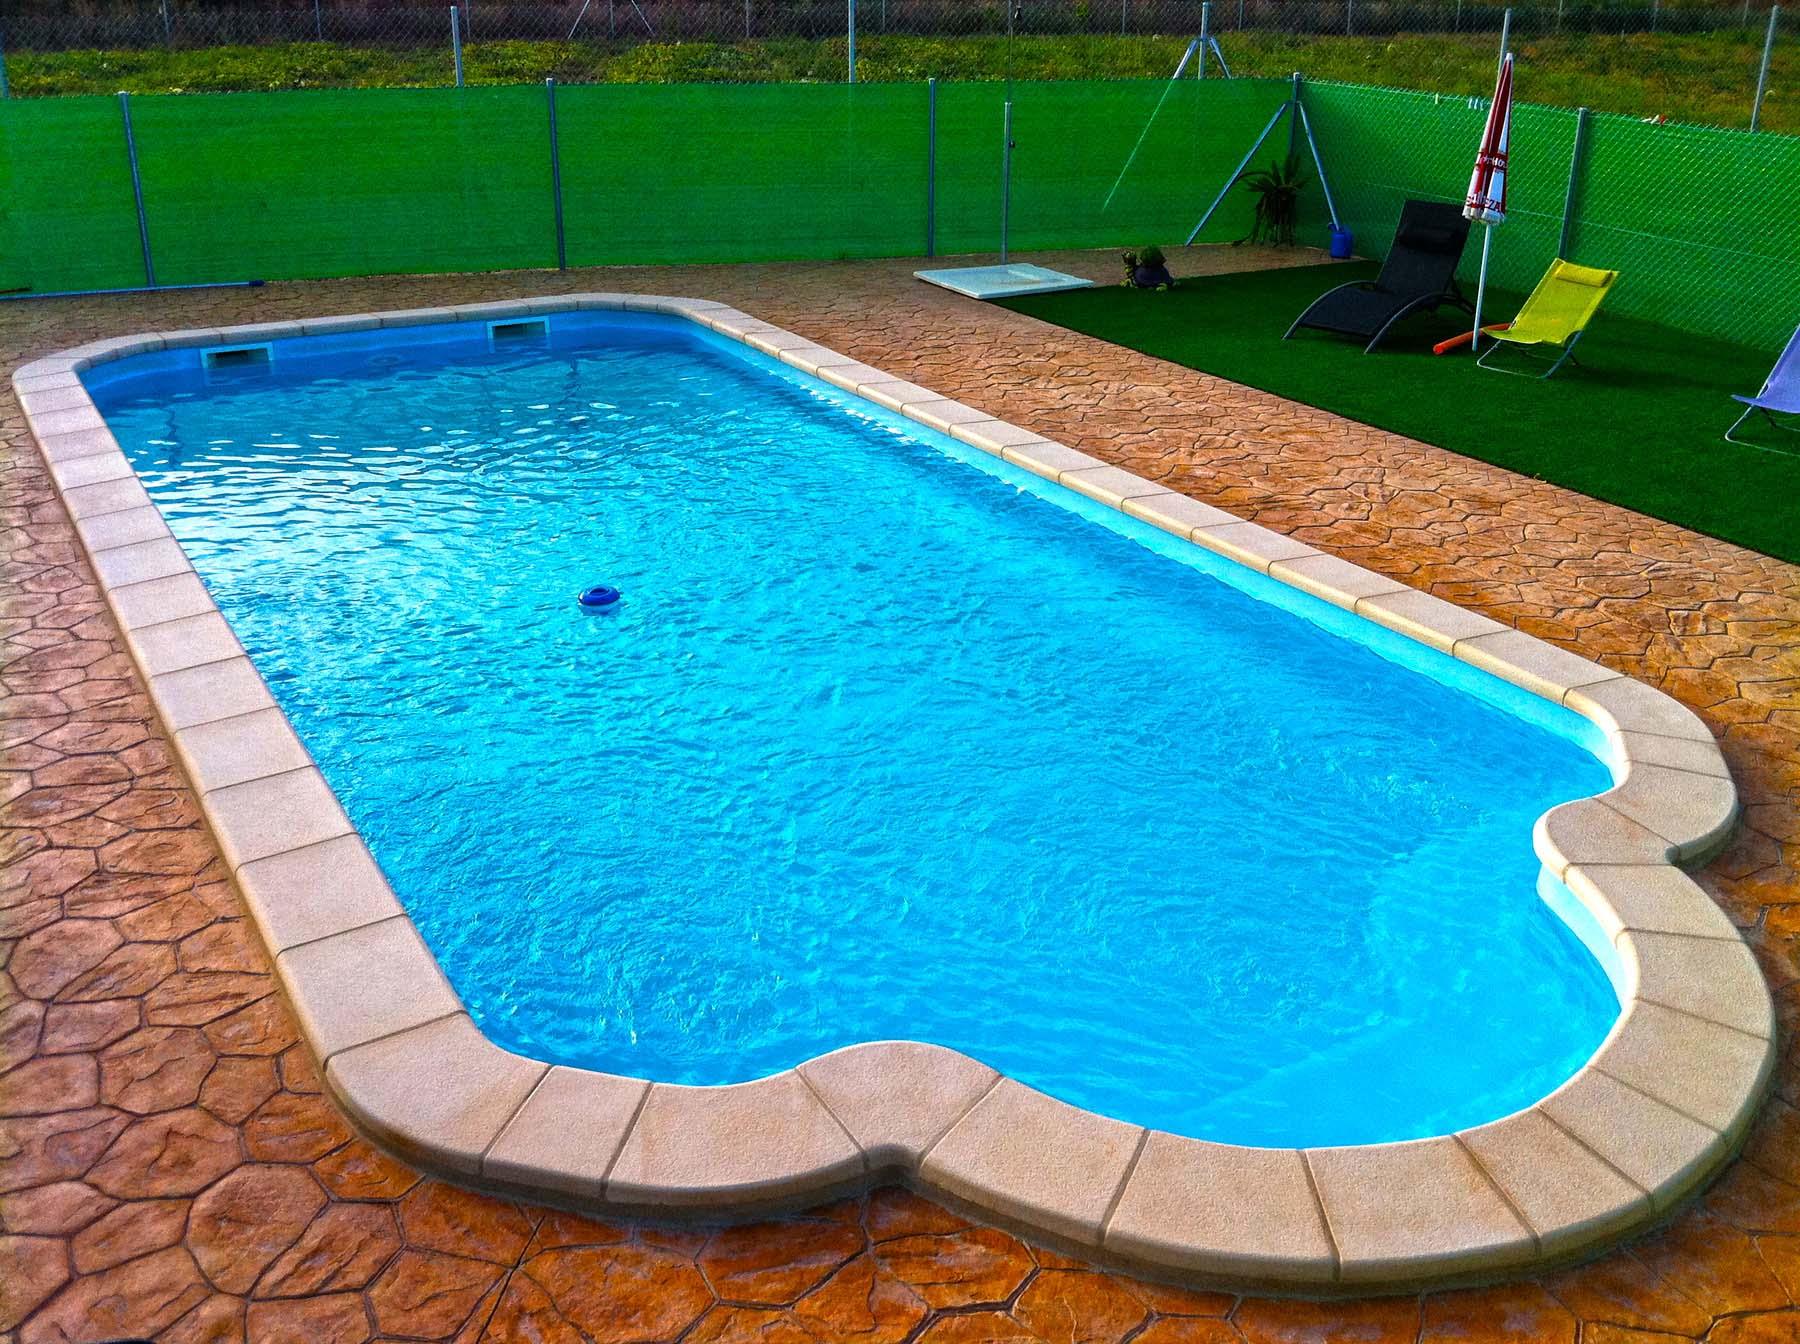 Galer a piscinas de fibra poli ster piscina plus for Piscinas enterradas poliester